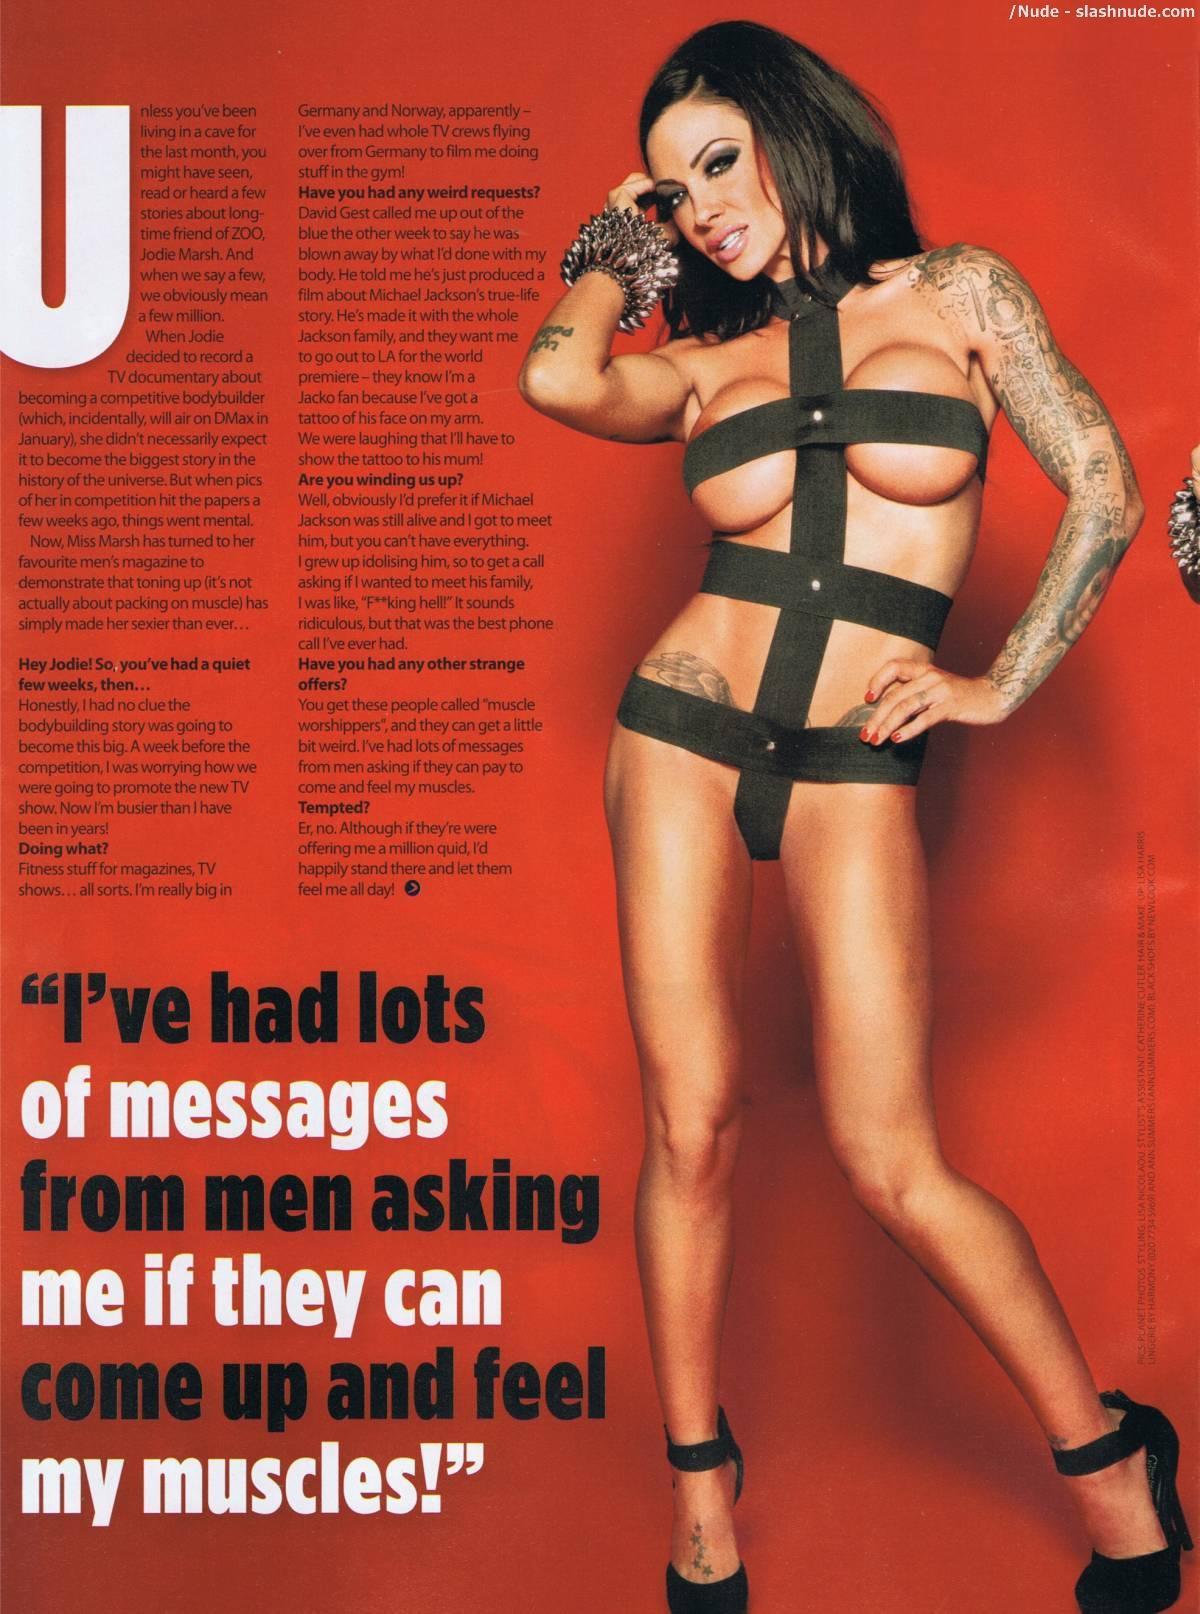 http://slashnude.com/photos/1/jodie-marsh-topless-because-she-a-bad-girl-6079-3.jpg